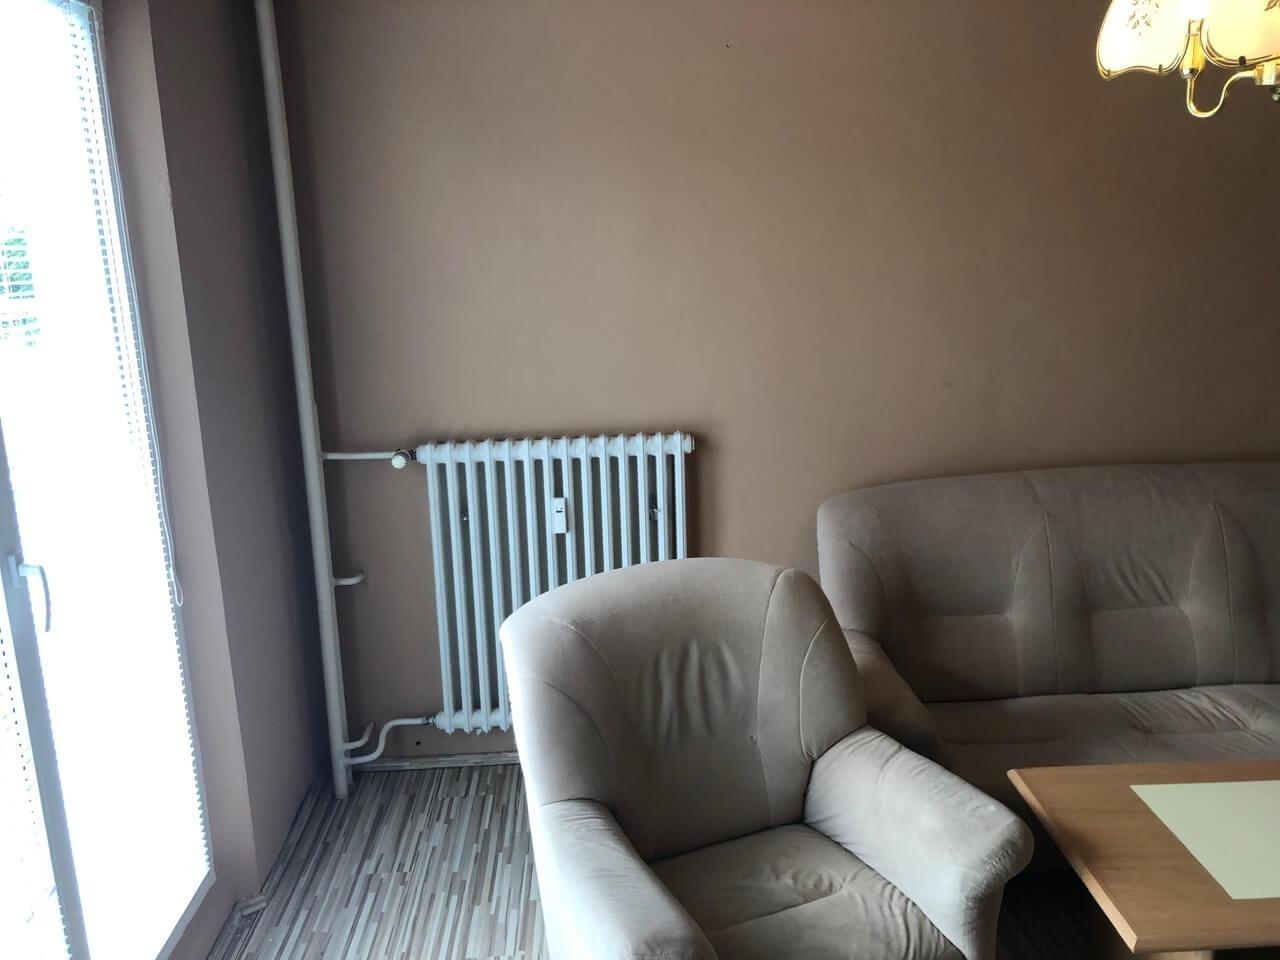 3 izbový byt, Račianska 85, 63m2, balkon 10m2, výborná lokalita-39